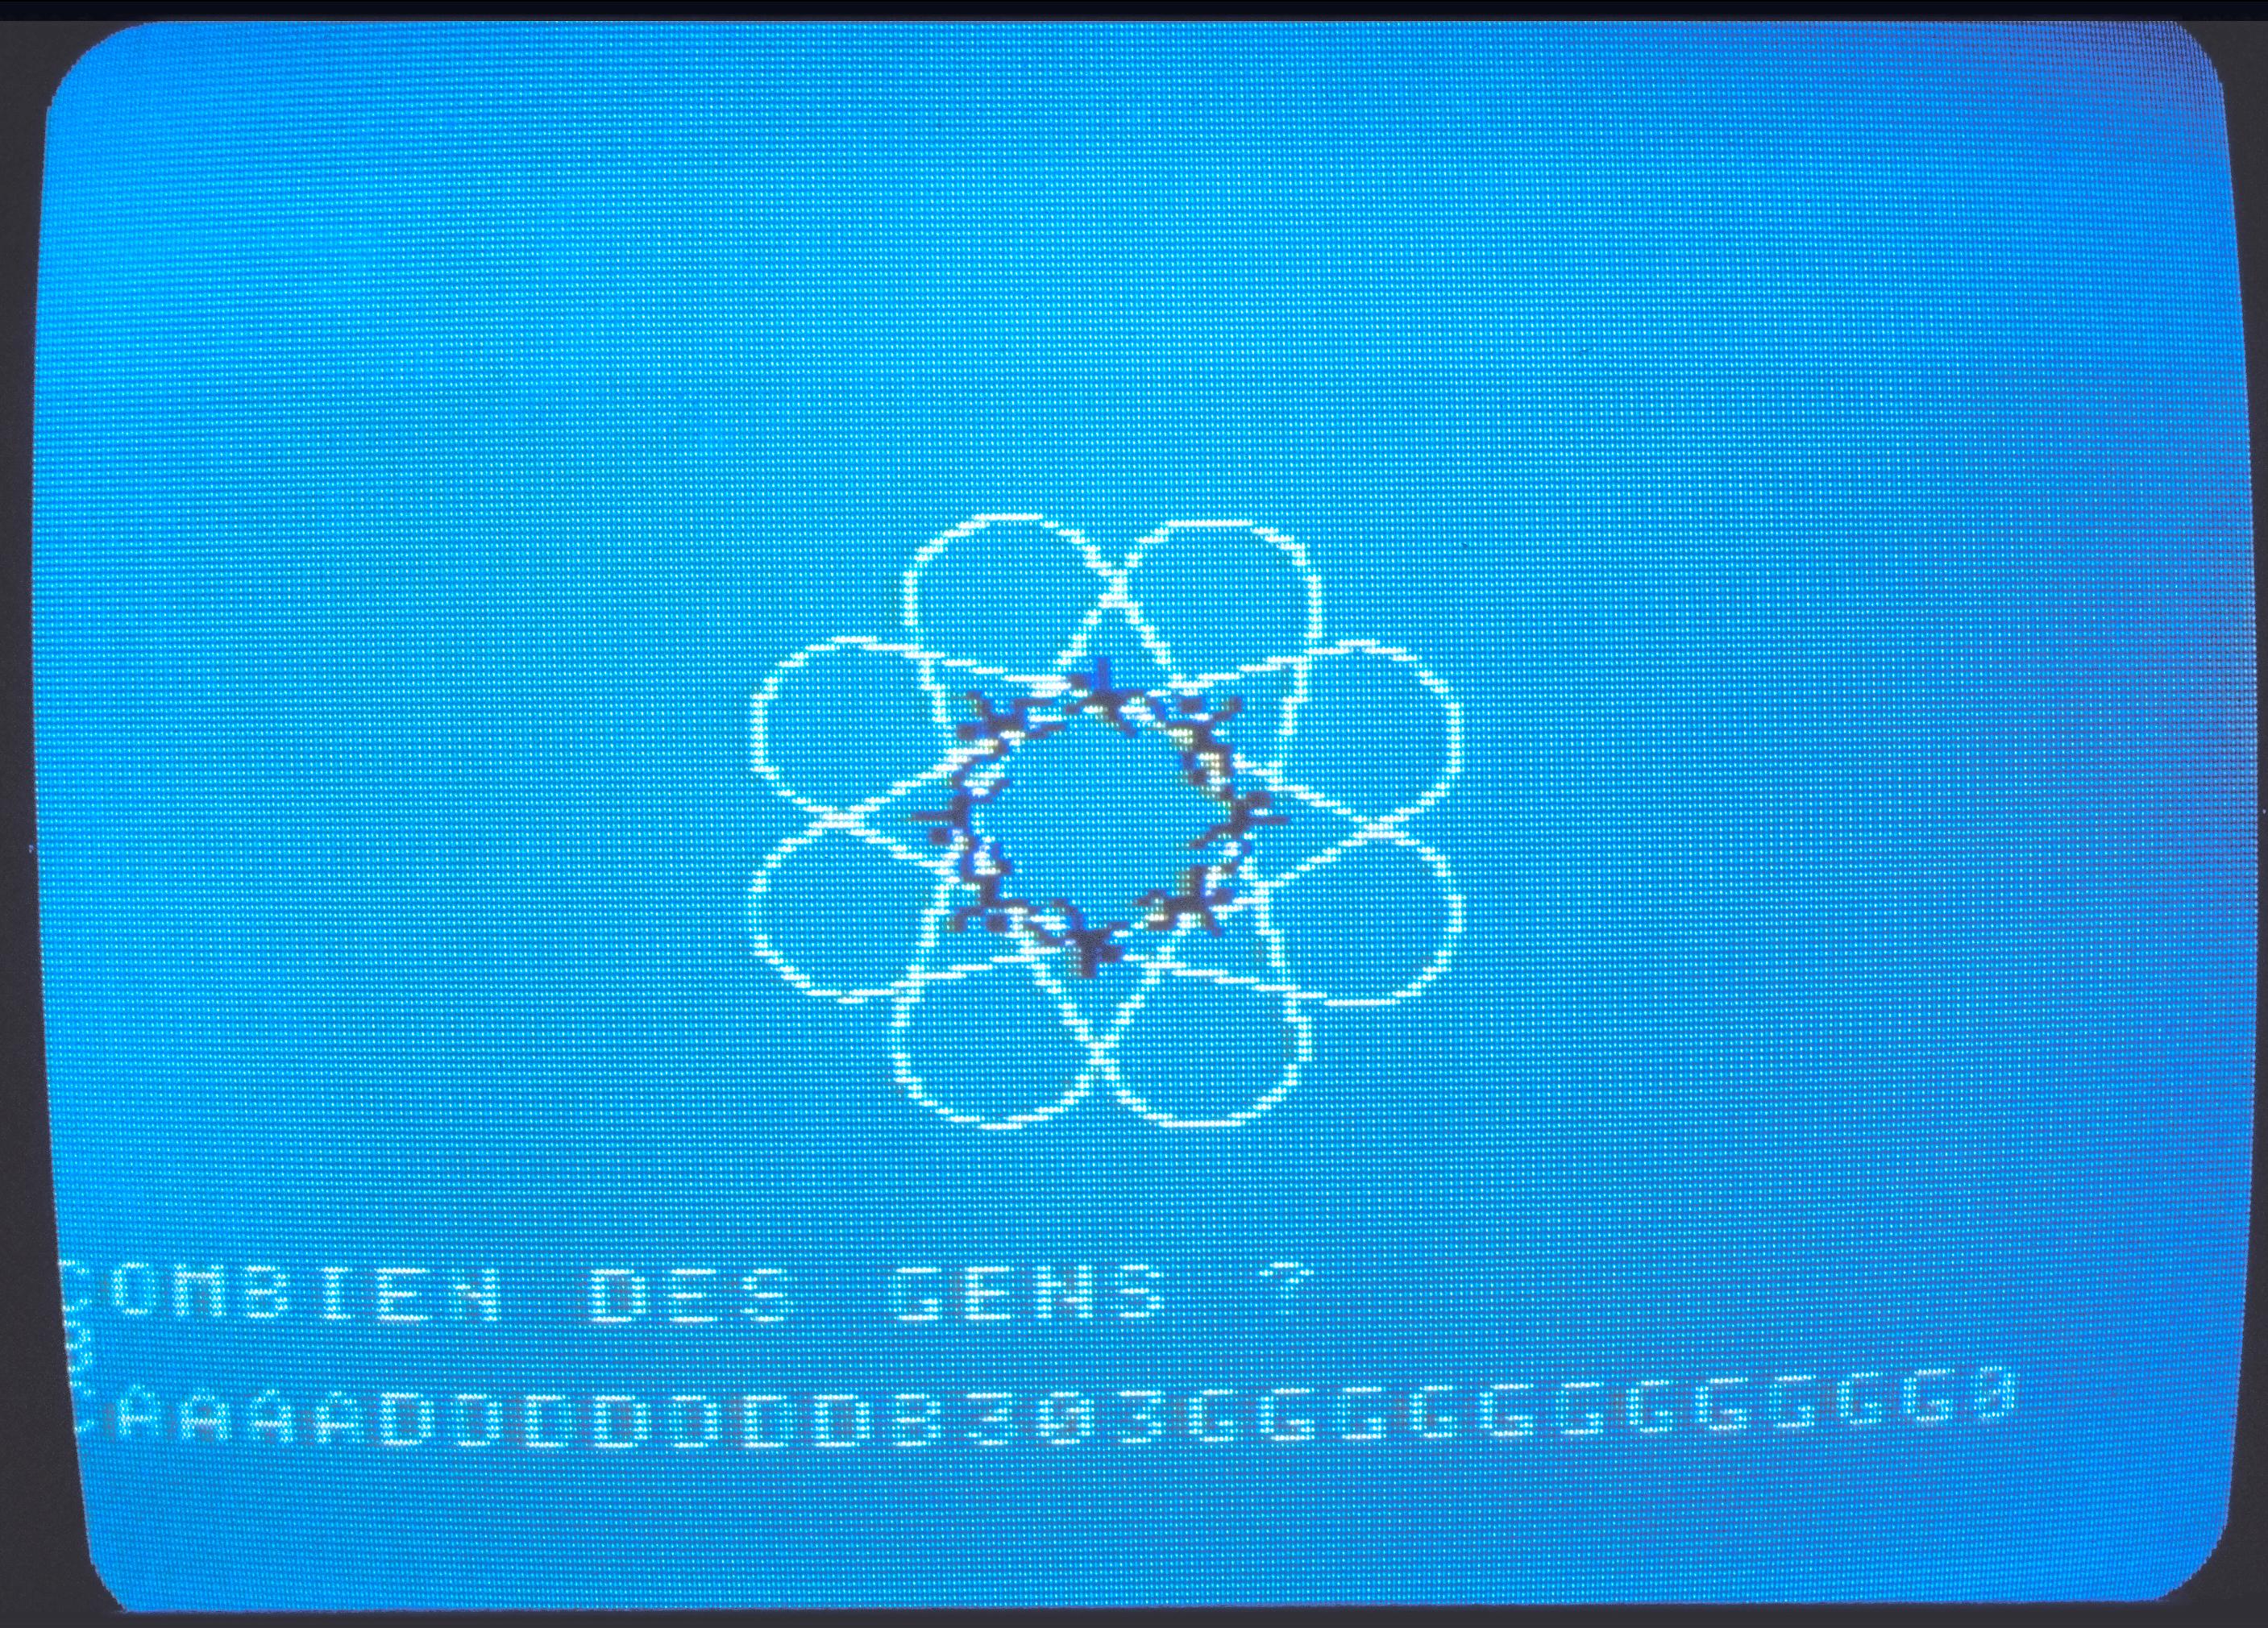 8 SKYDIVERS design, 1983